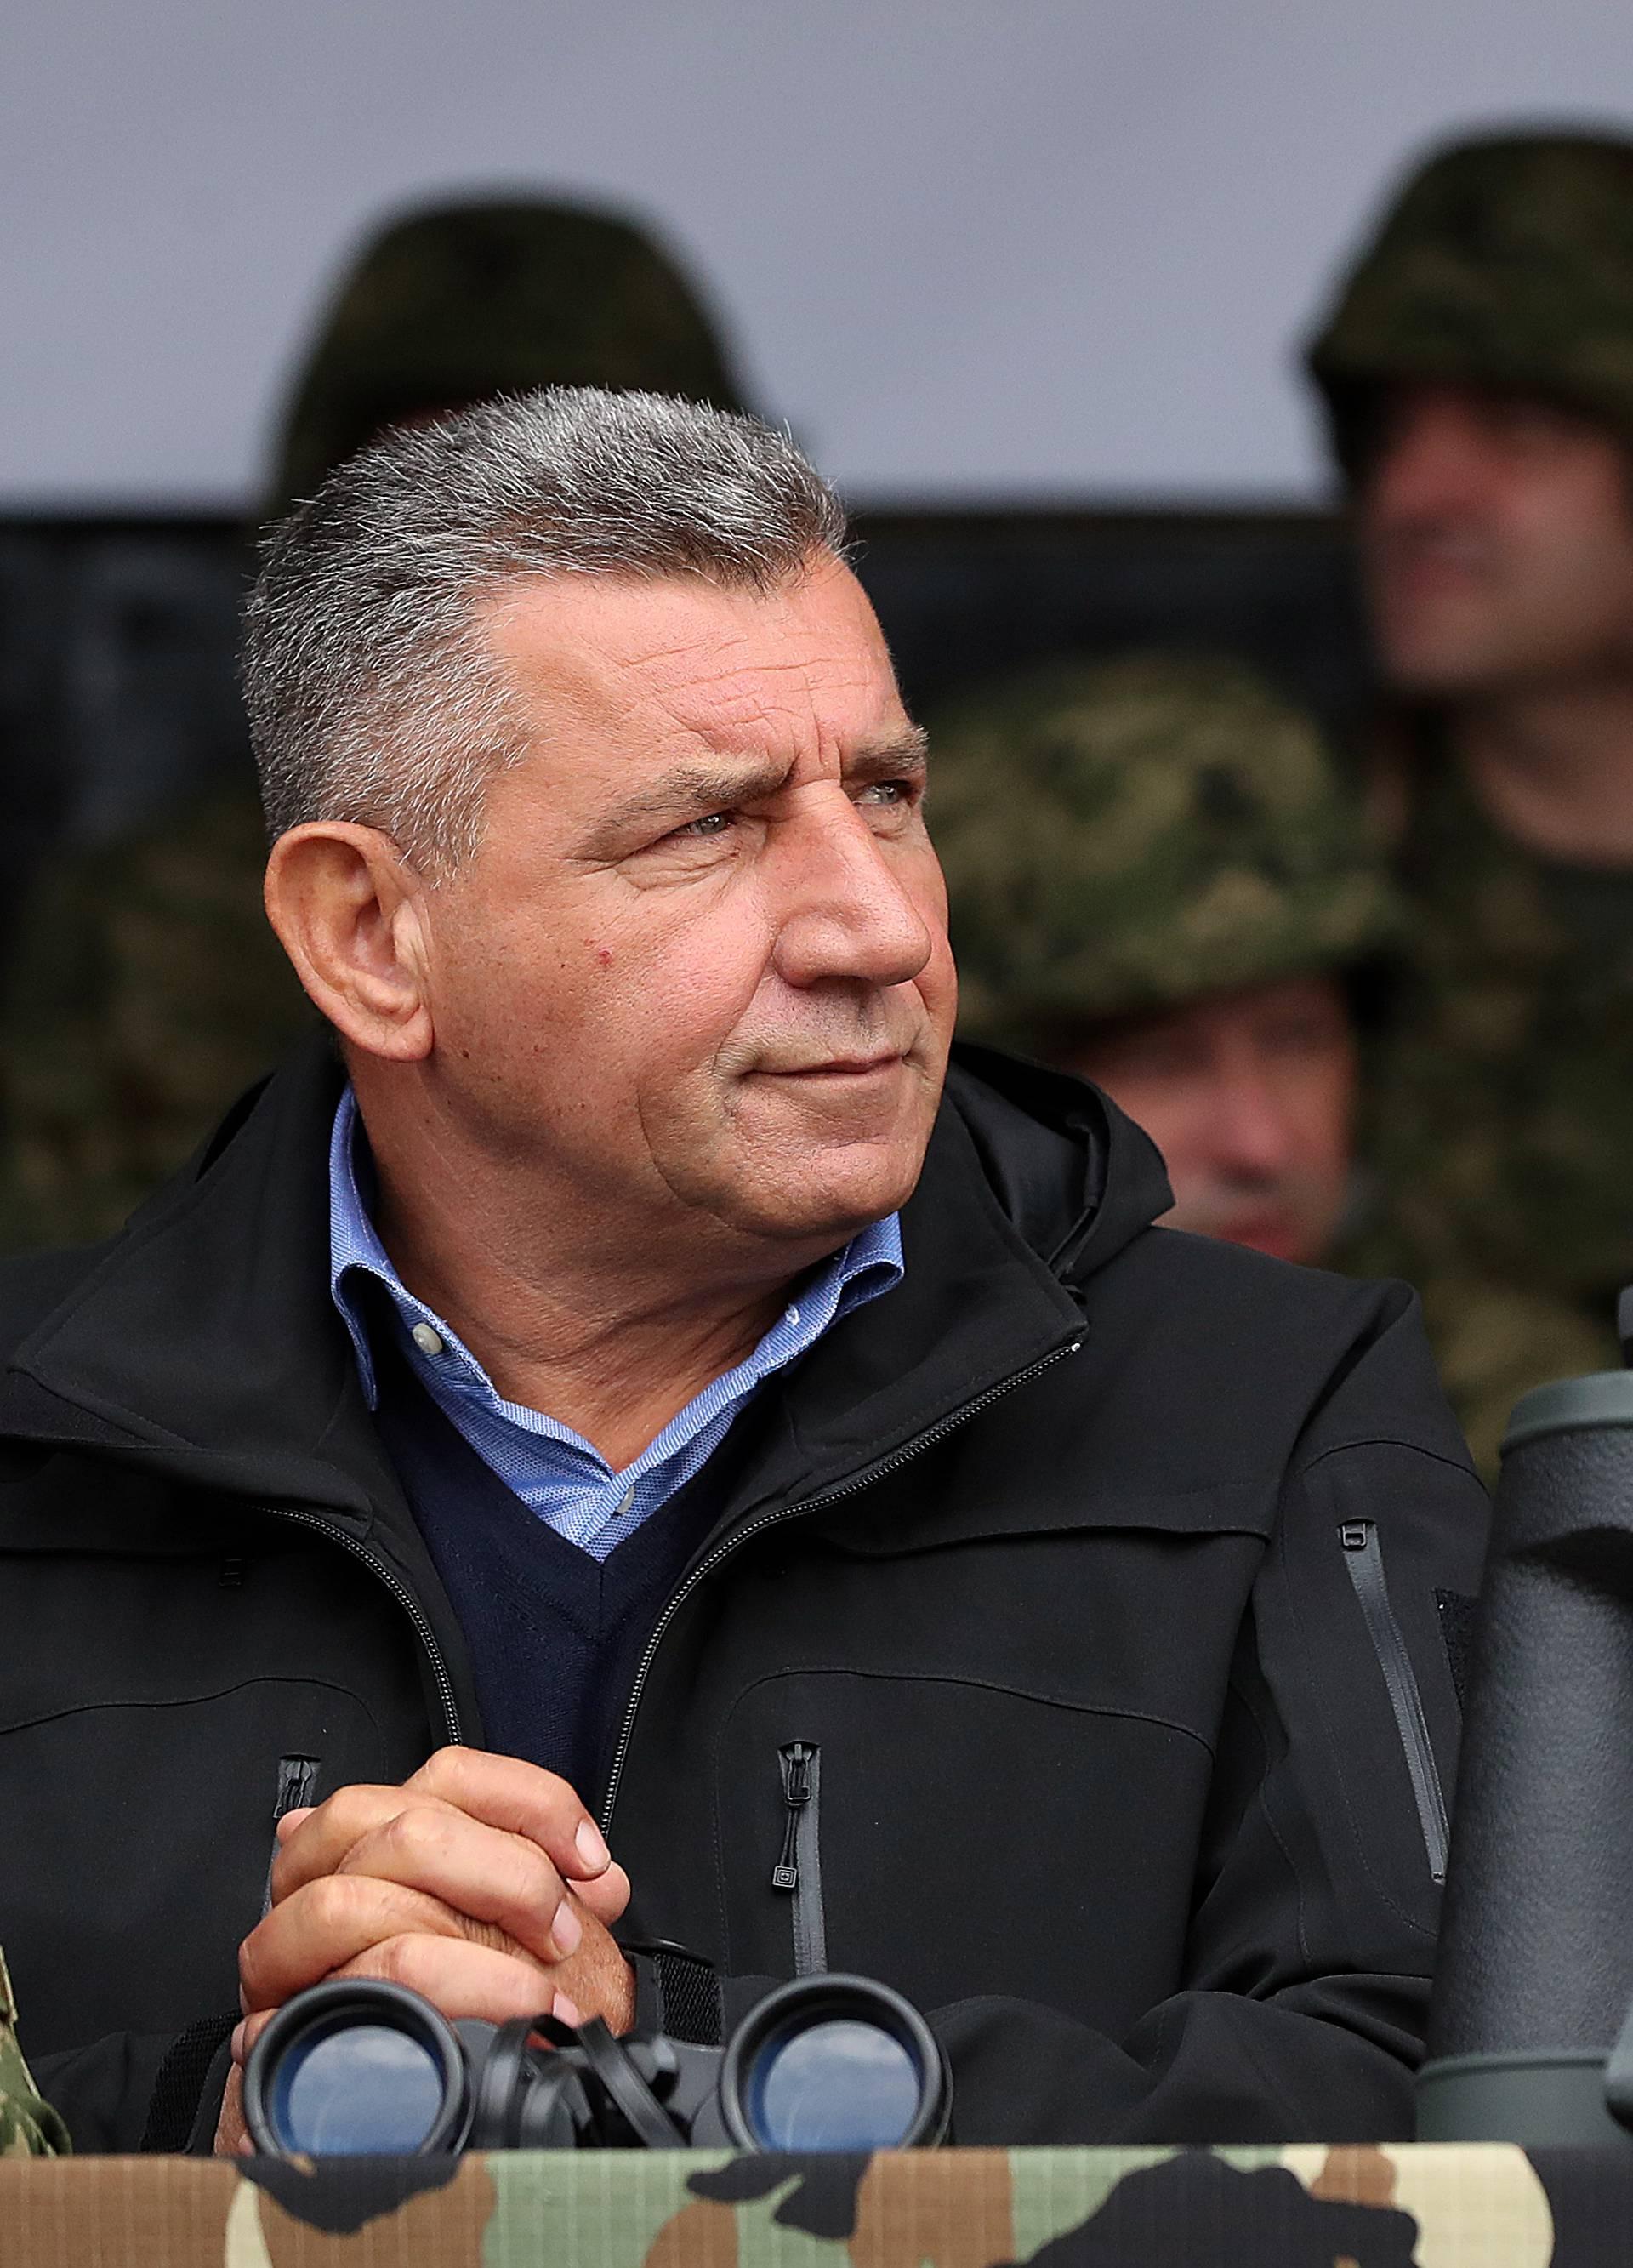 Slunj: Gotovina, Markač i Krstičević nazočili vojnoj vježbi Velebit 18